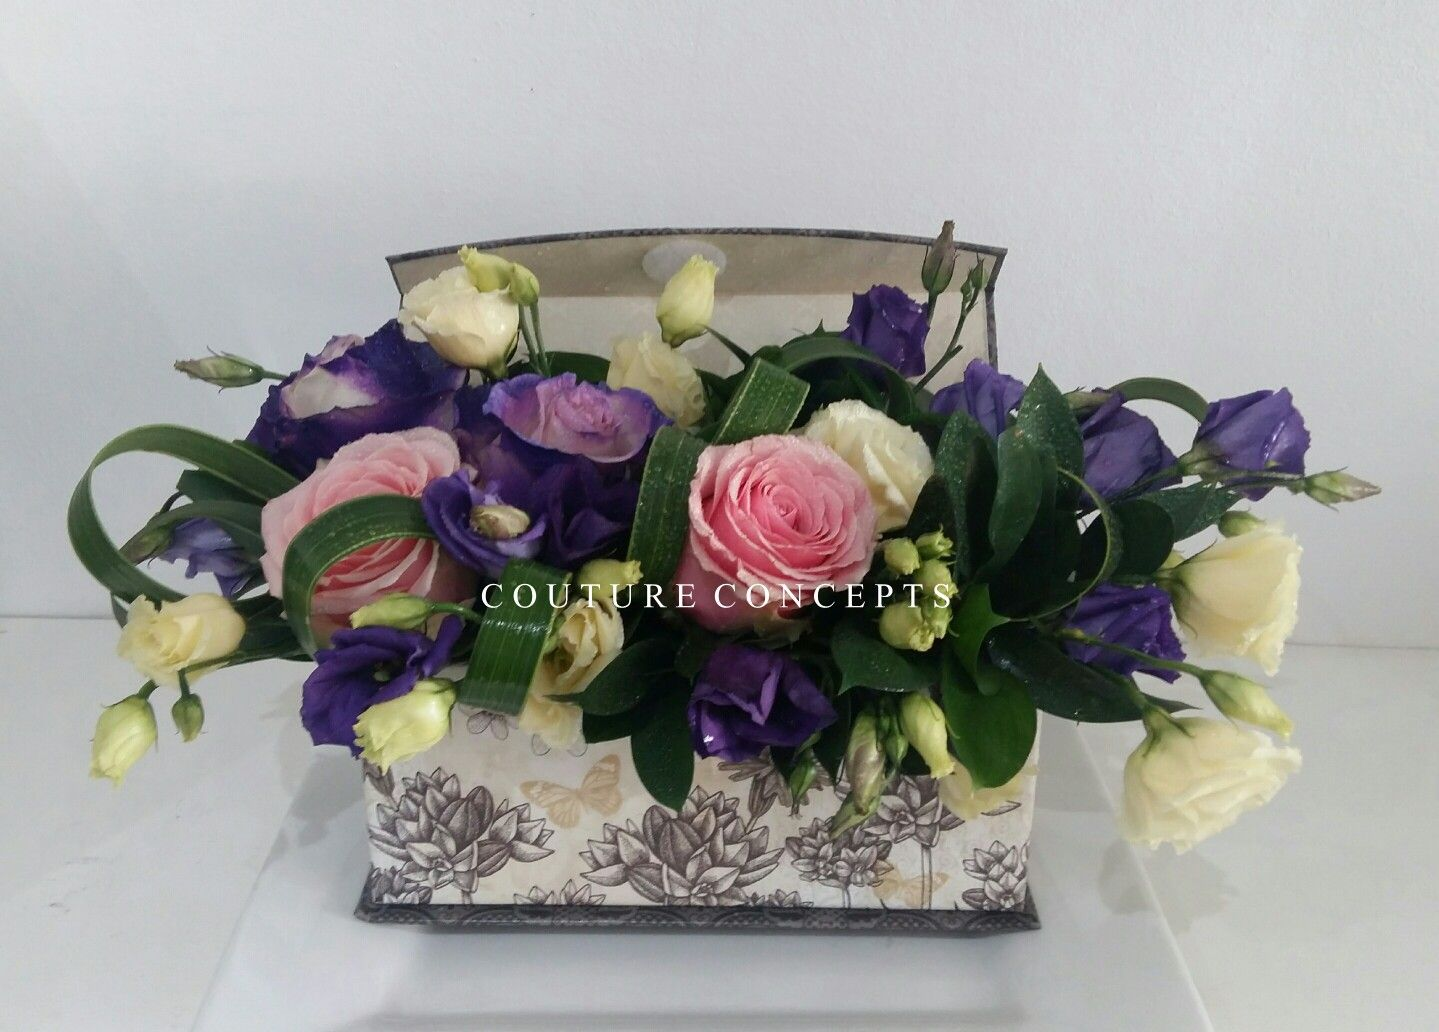 Tge #CoutureConceptsExperience through florals.